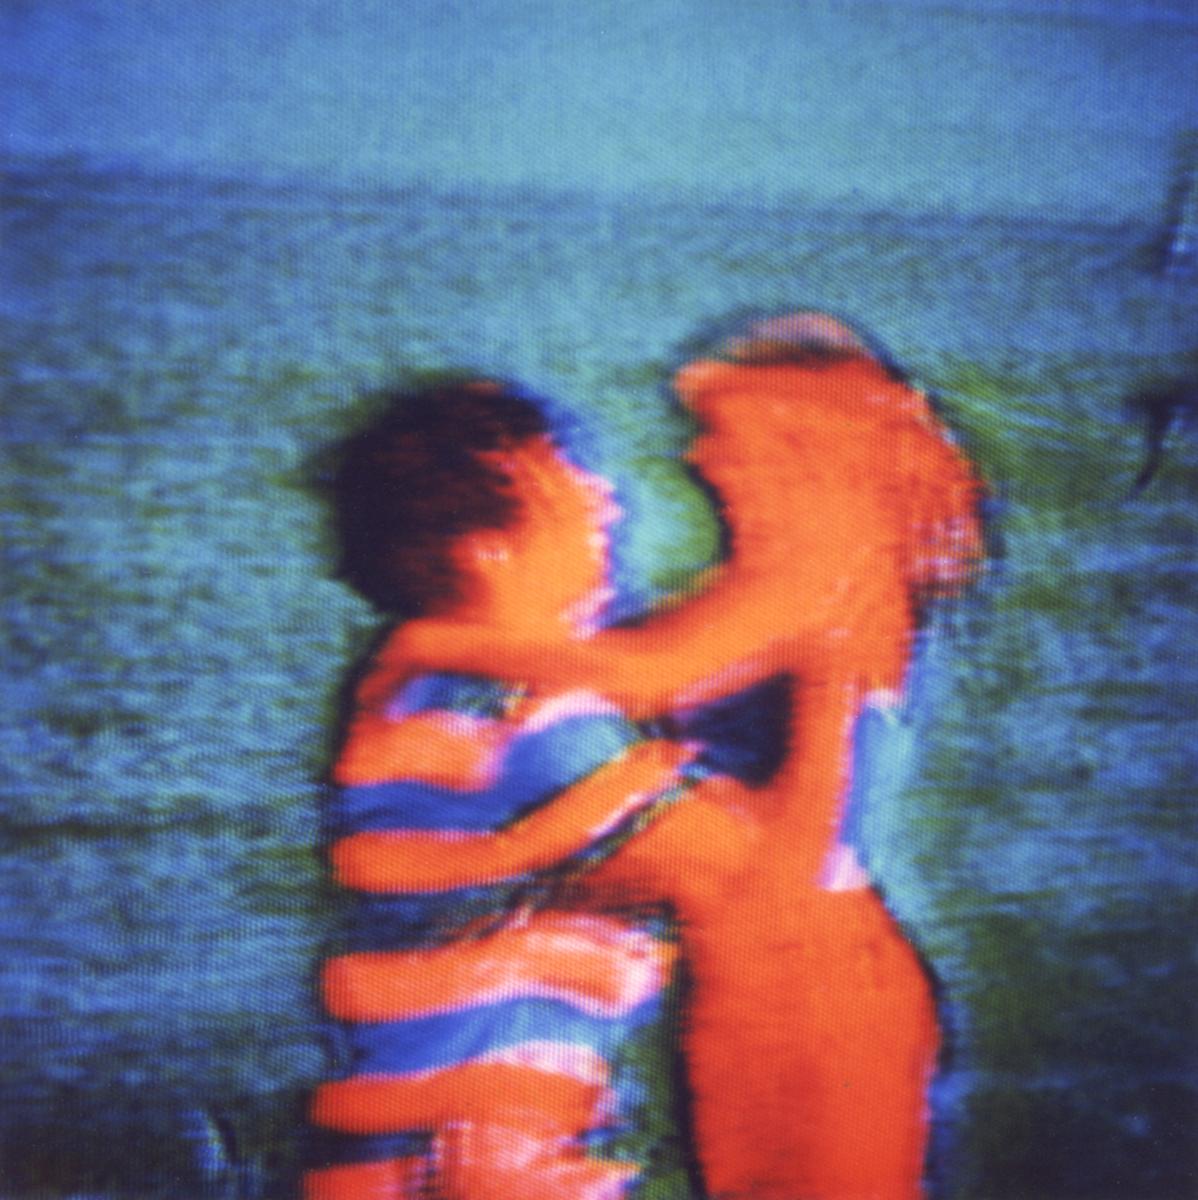 Television-TV-Polaroid-SX70-Couple-Beach.jpg